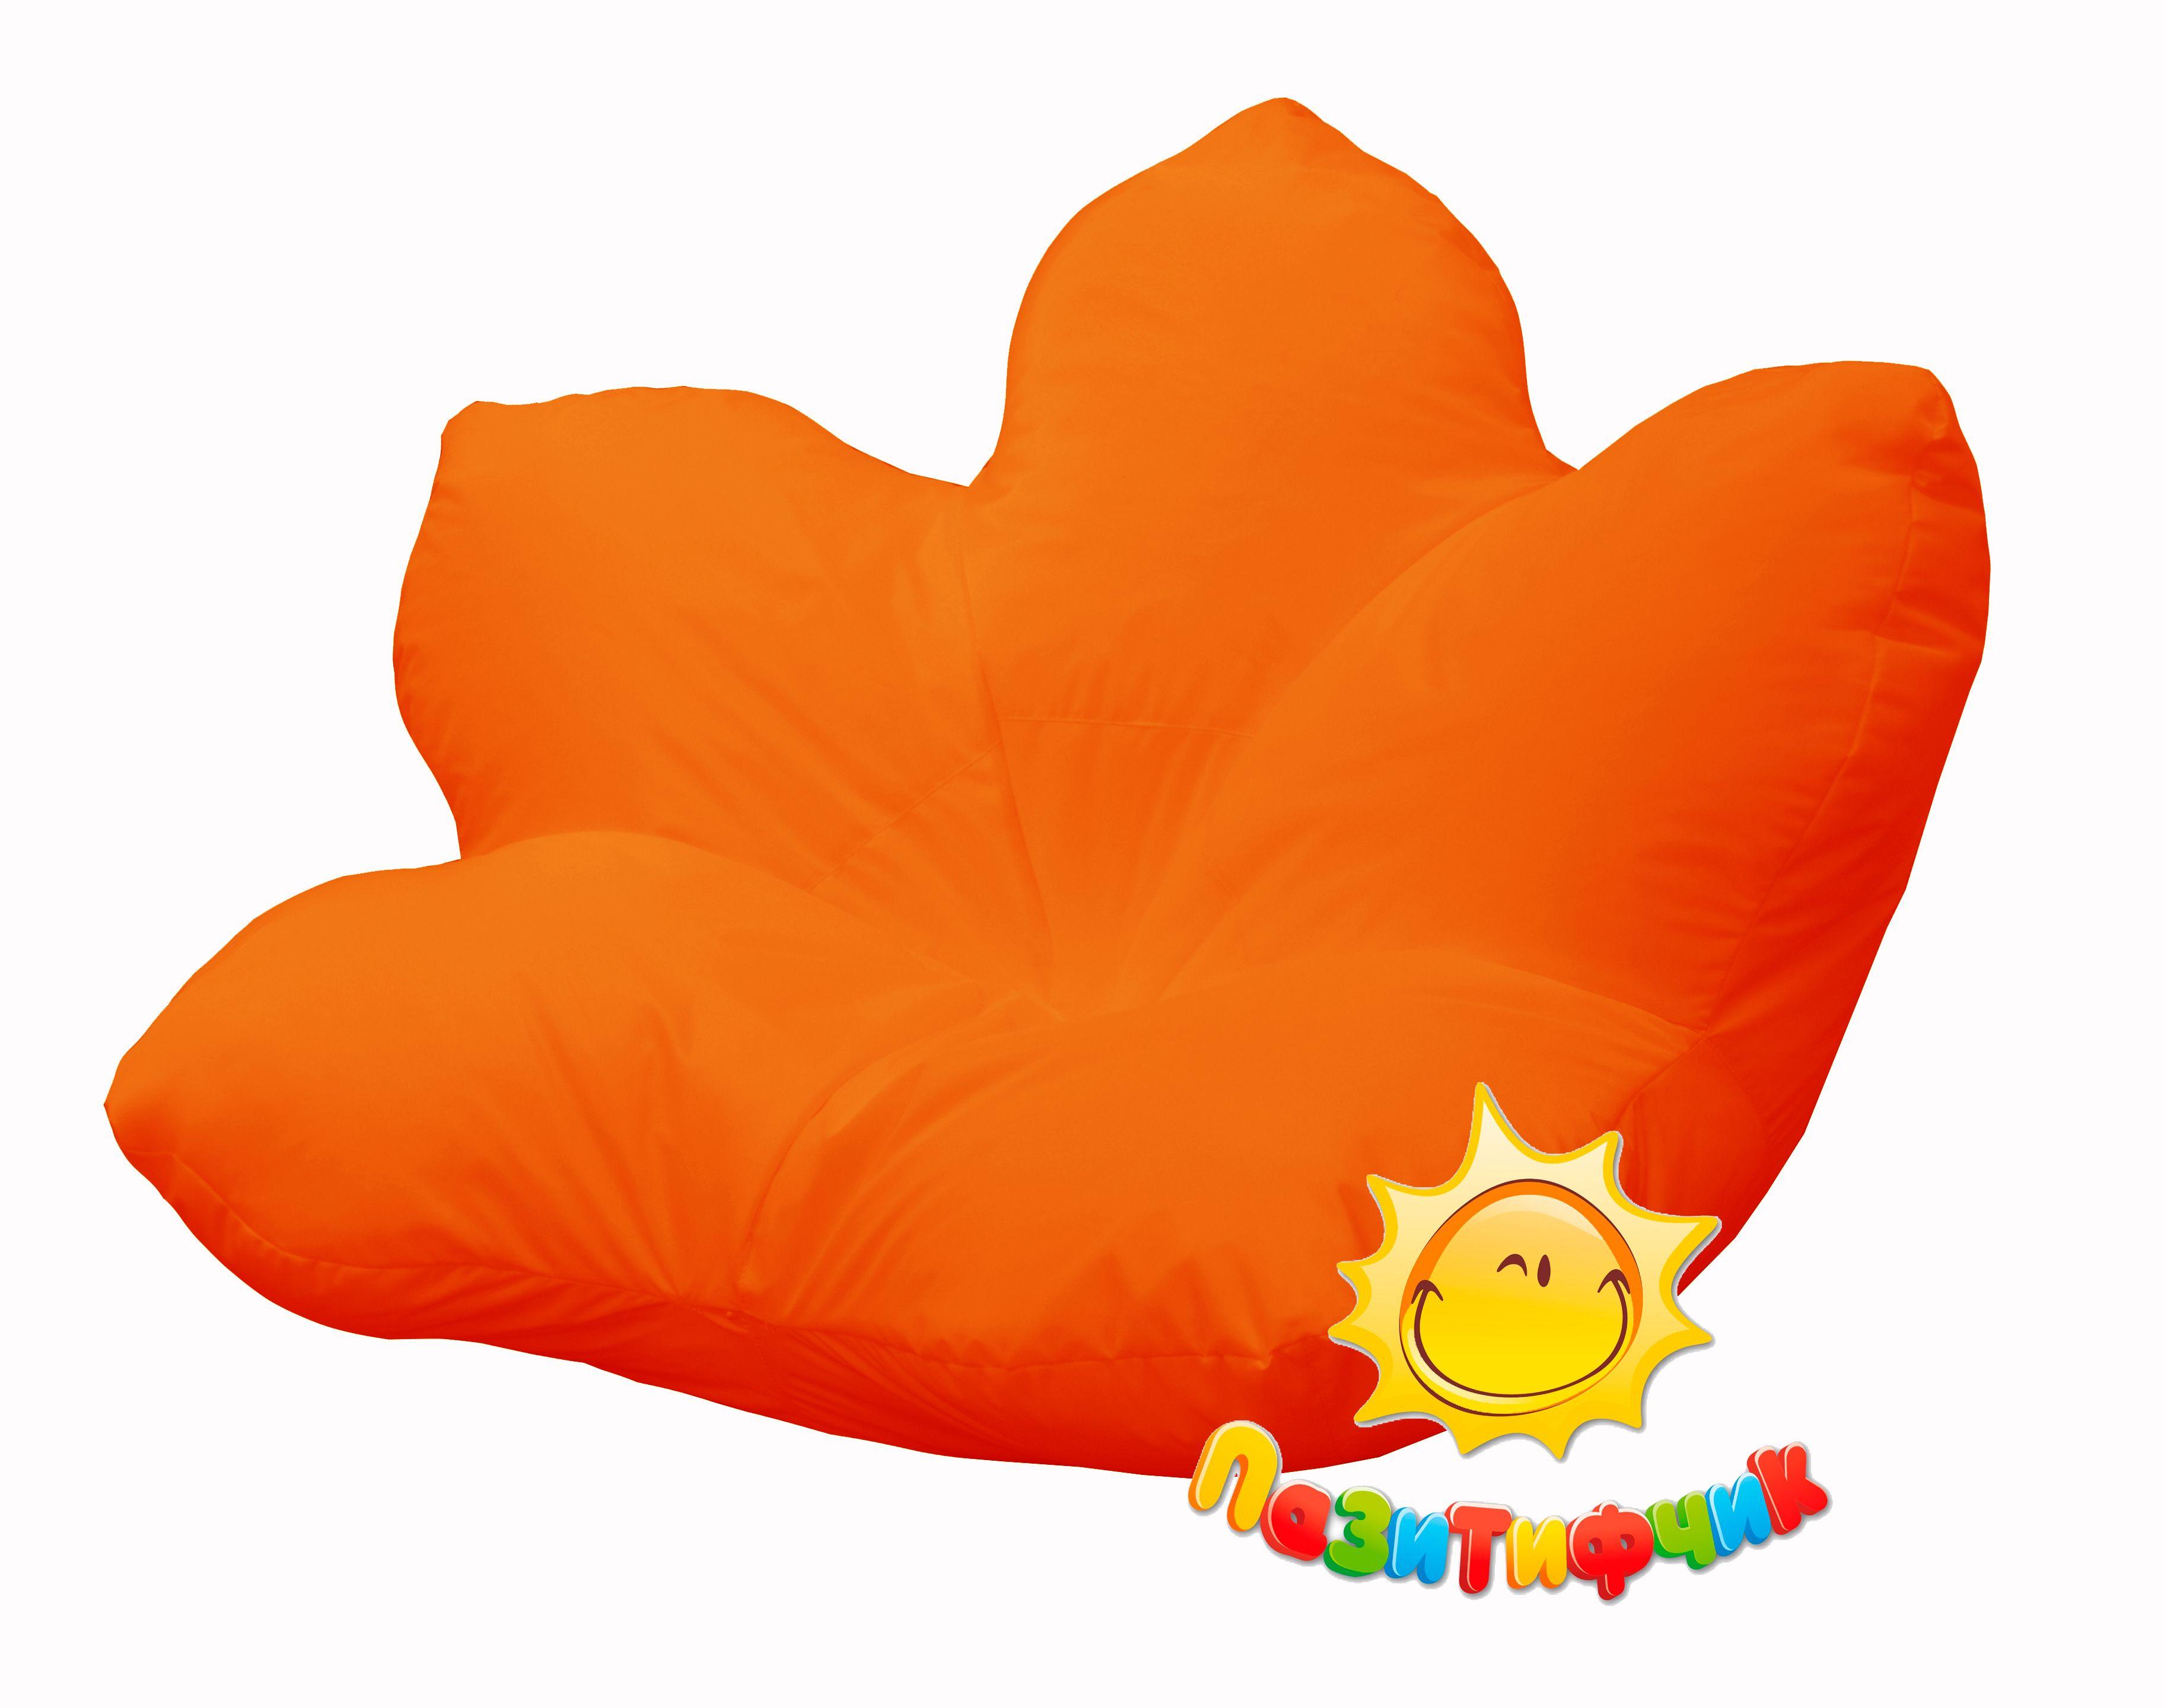 Кресло-мешок Pazitif Цветок Пазитифчик, размер XXXL, оксфорд, оранжевый